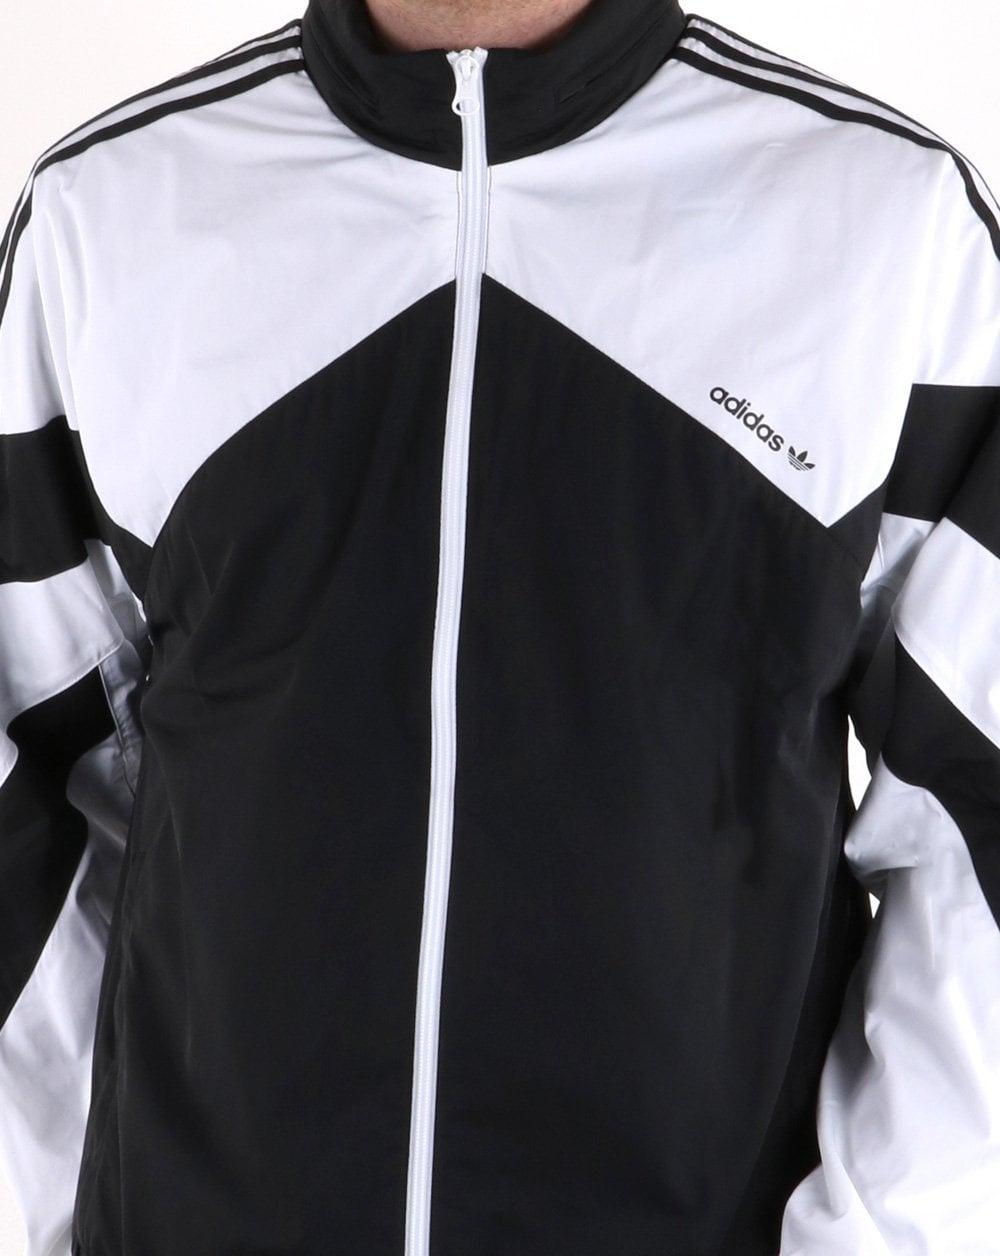 e7bc3a1c43 adidas Originals Adidas Originals Palmeston Windbreaker Black white